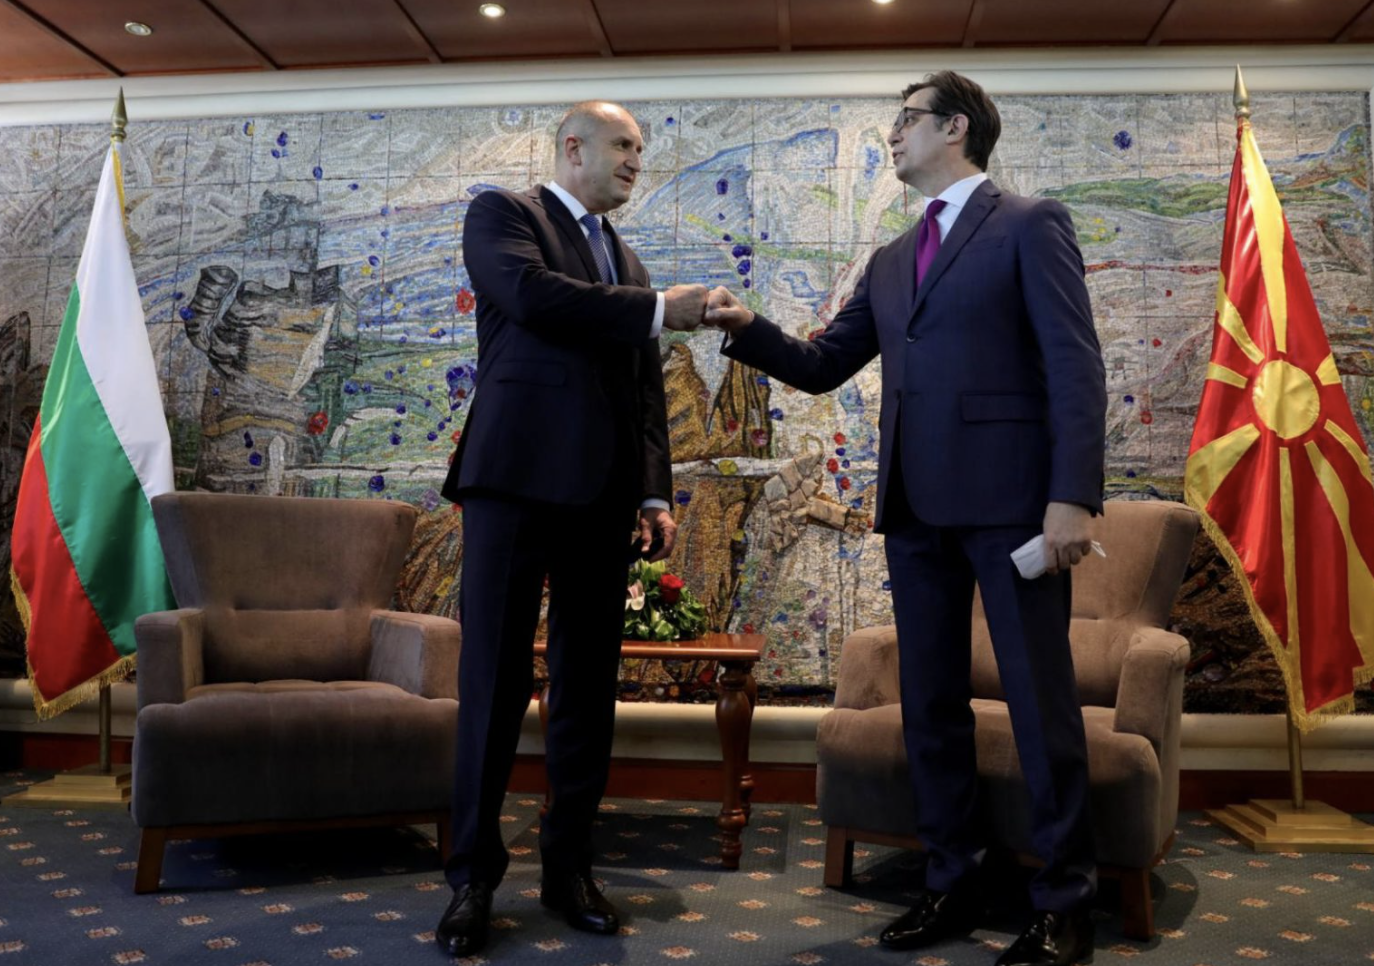 Pendarovski: Ο Radev είναι πολιτισμένος και σοβαρός, αλλά εμμένει στις βουλγαρικές απαιτήσεις